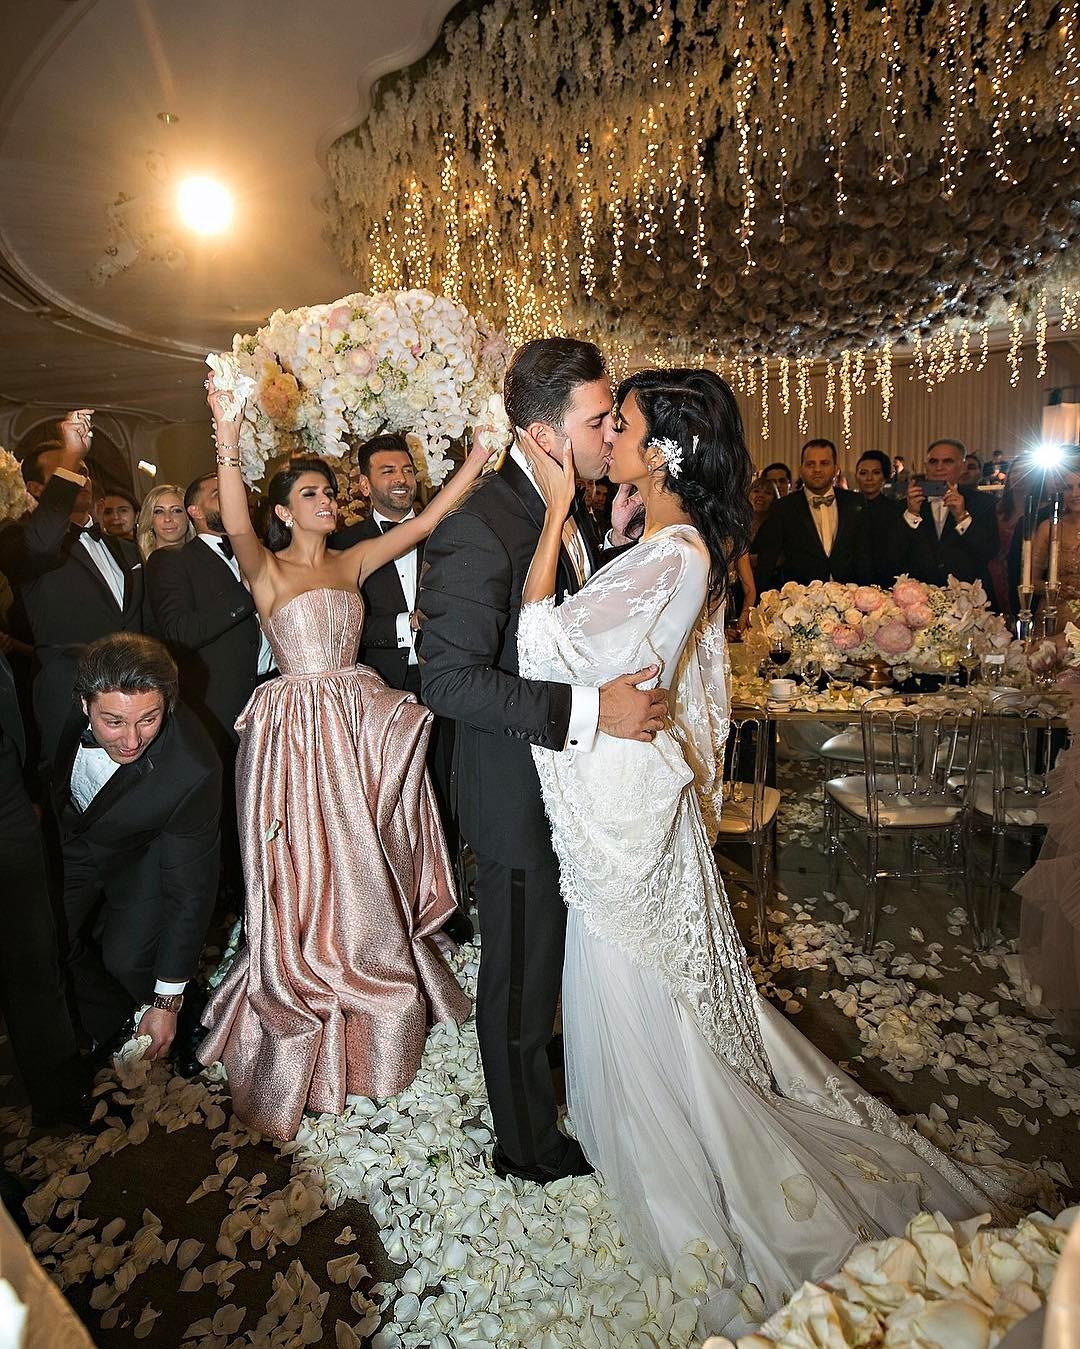 Shahs Of Sunset | Dara Mir & Lilly Ghalichi Mirs Wedding